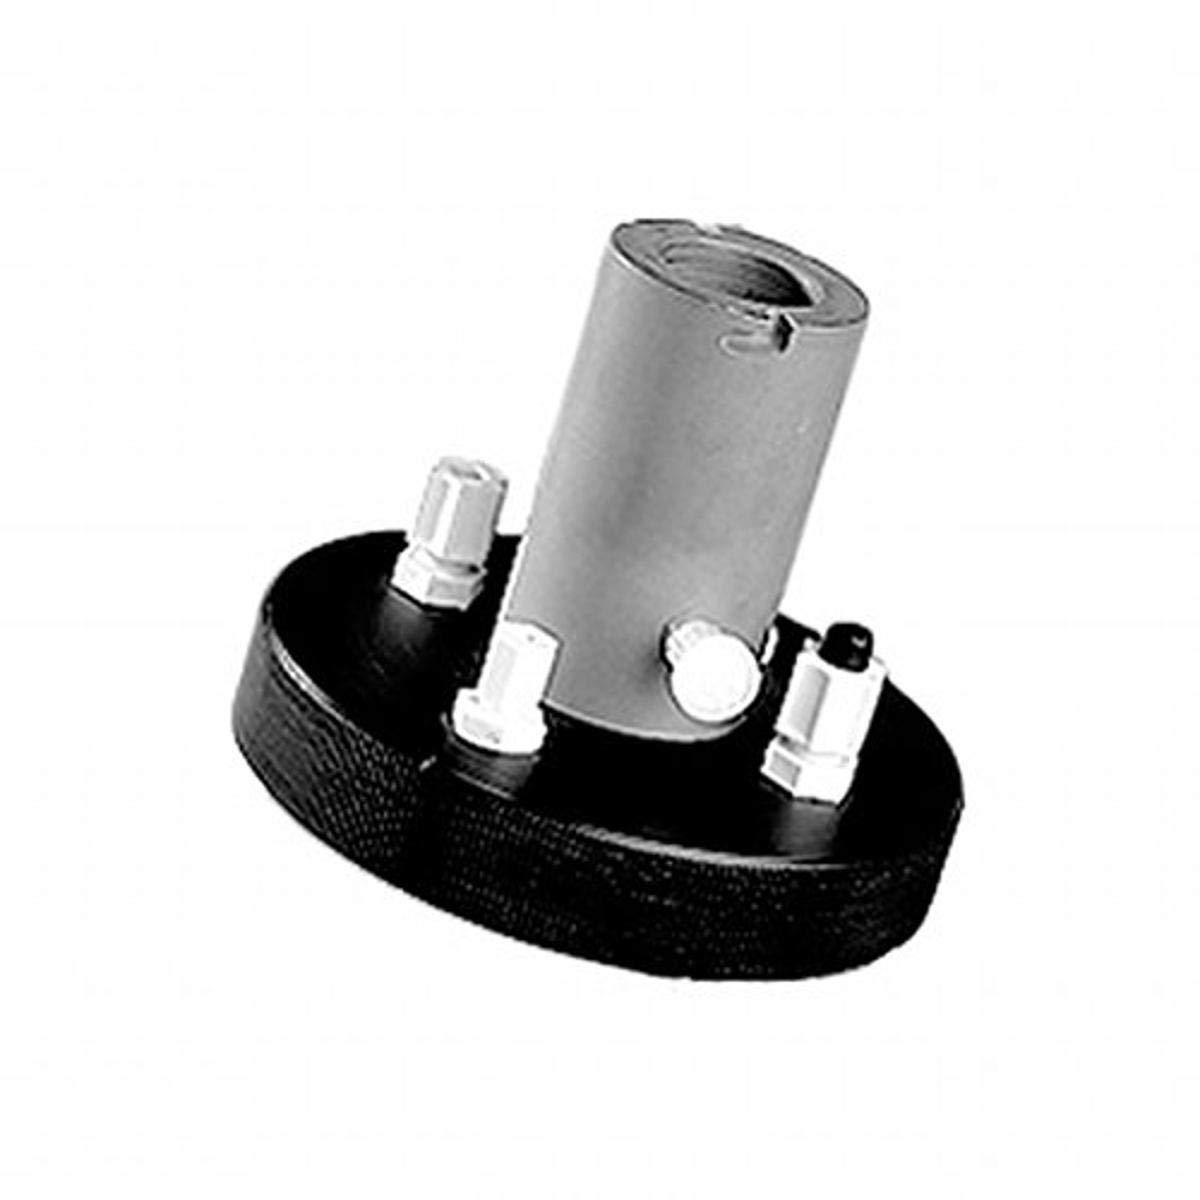 Corning Center Neck Cap Compression Fitting 8